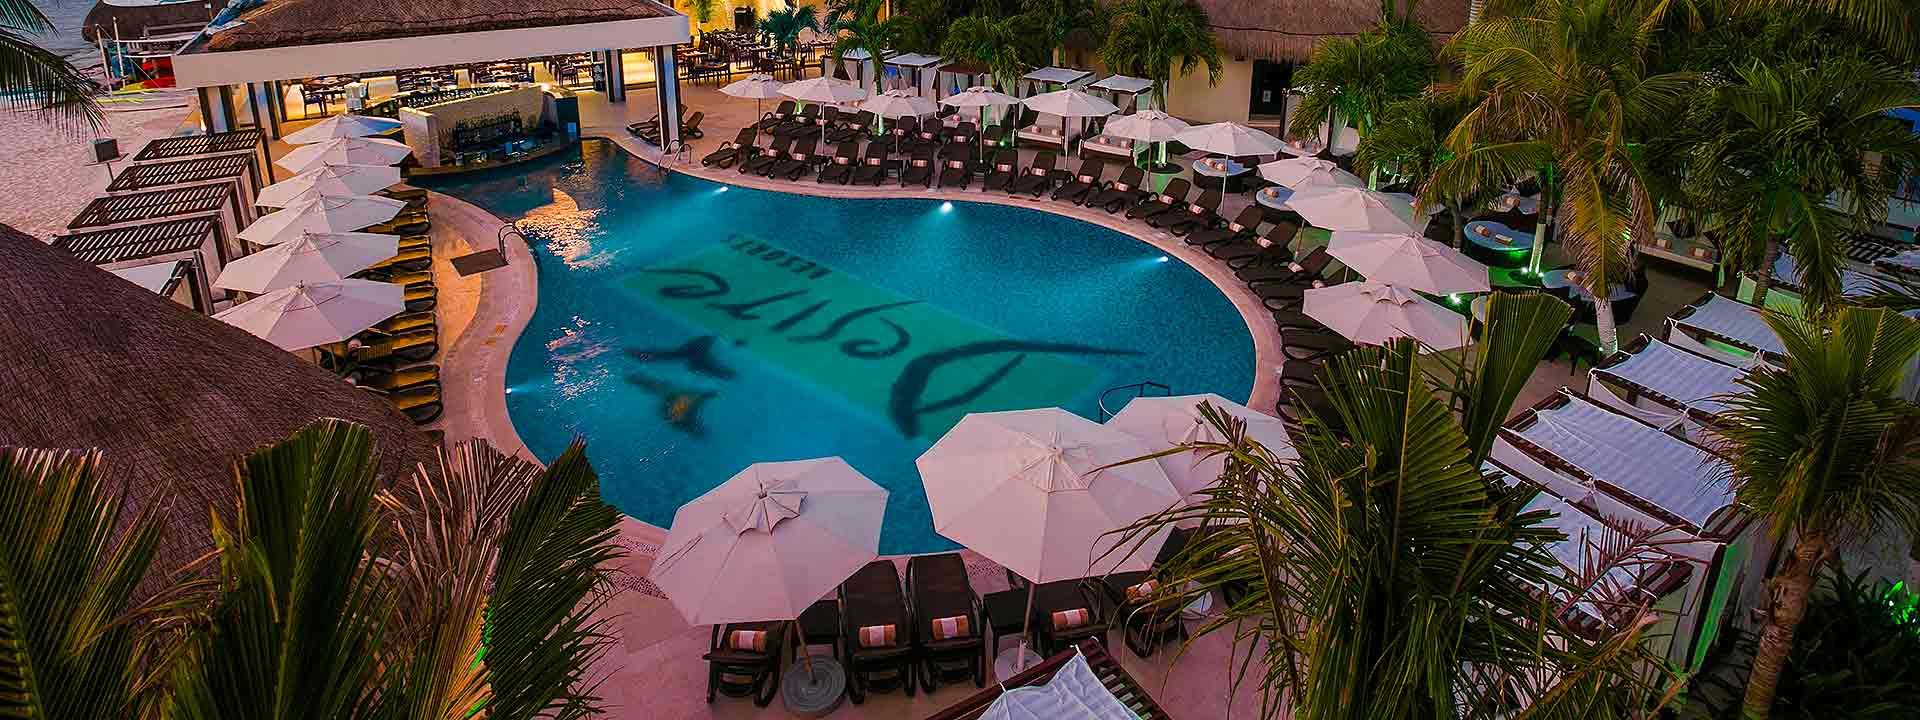 Desire Resort Riviera Maya Pool